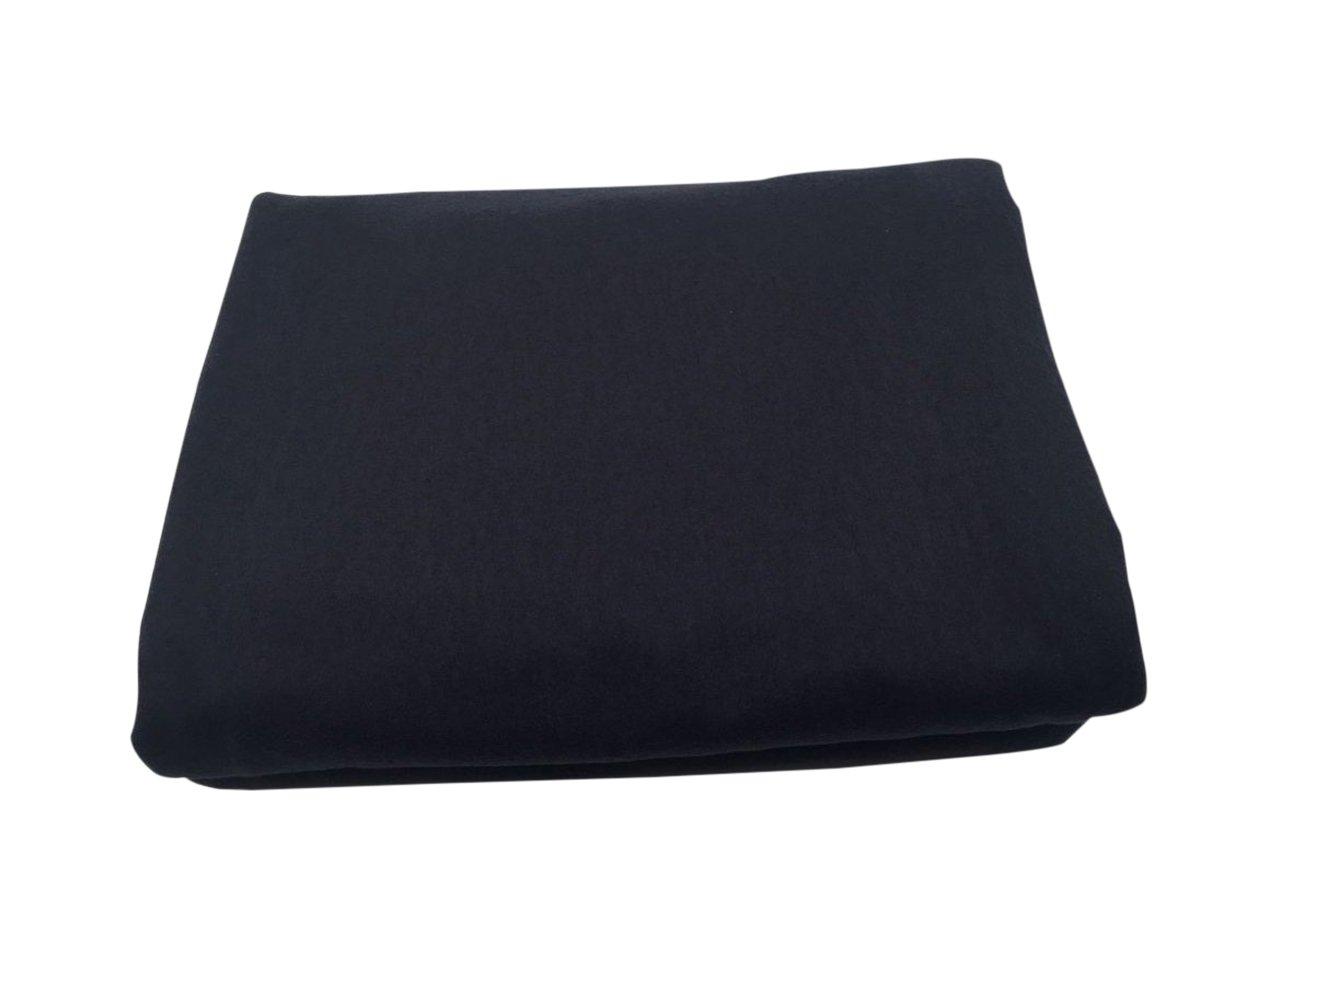 OTW PAVILION Anti-Tarnish Silver Cloth,Tarnish Free Silver Cloth,Pre-Cut by The Yard -Darkgrey(5 Yards by 39'' Width) by OTW PAVILION (Image #1)